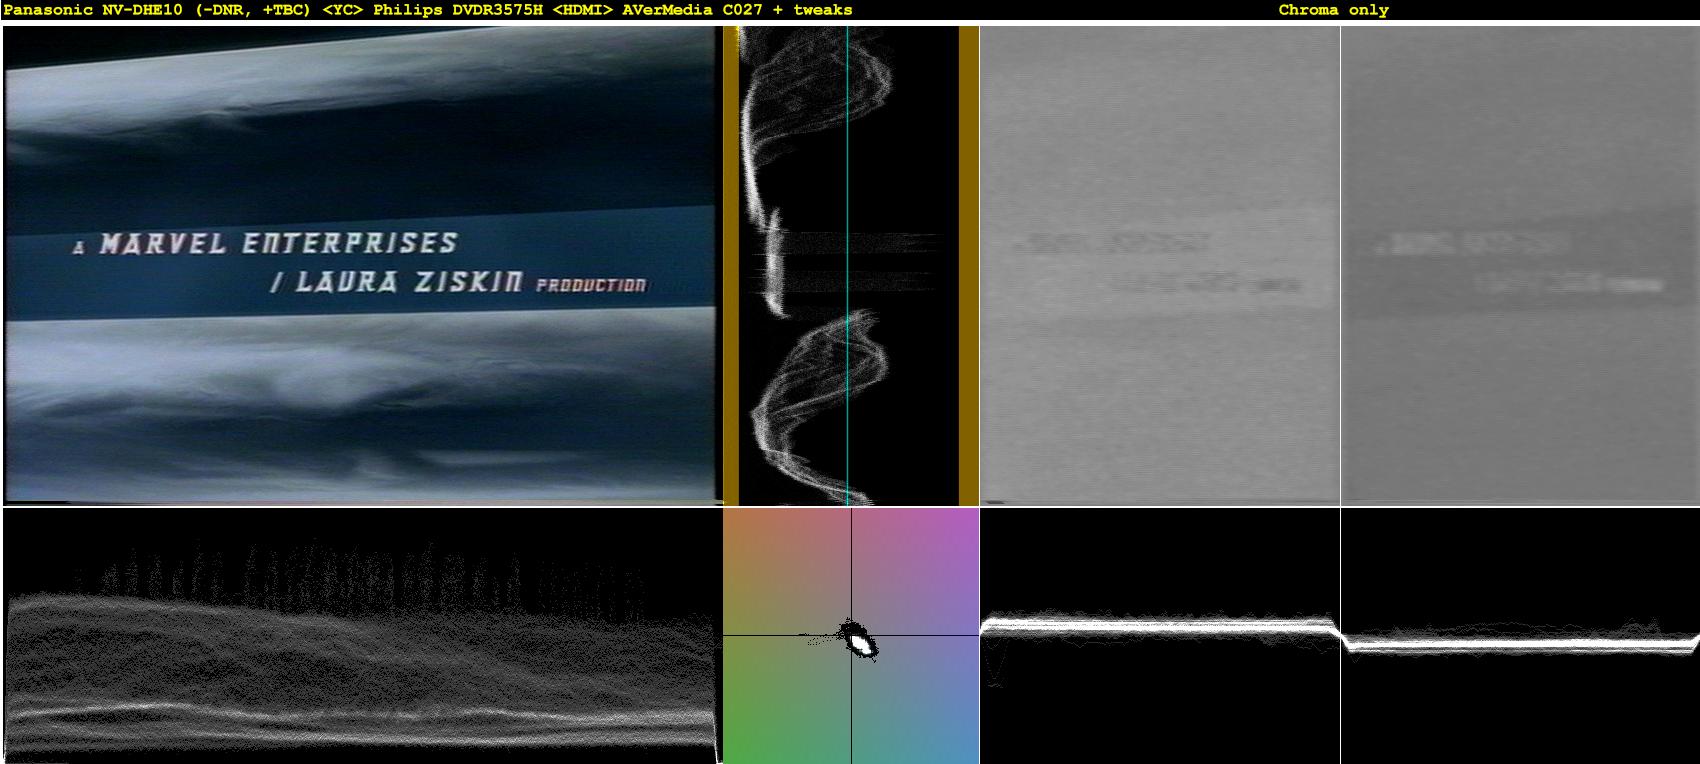 Click image for larger version  Name:0-09-01 - Panasonic NV-DHE10 (-DNR, +TBC).png Views:1177 Size:947.2 KB ID:37992